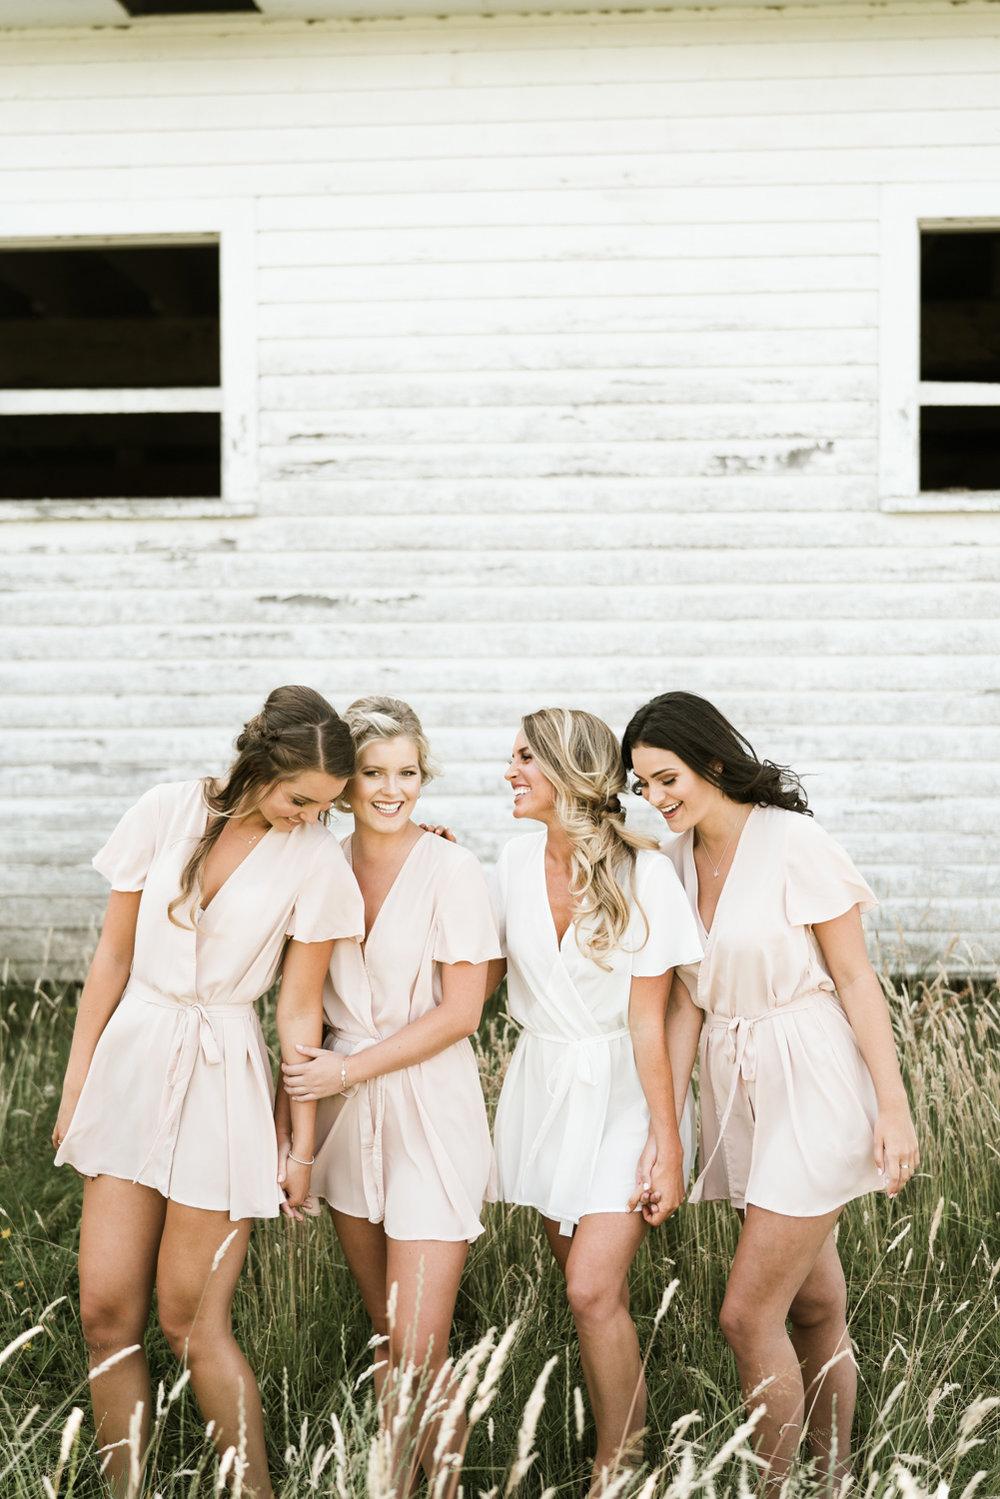 April Yentas Photography - South Bend Shoot-3.jpg